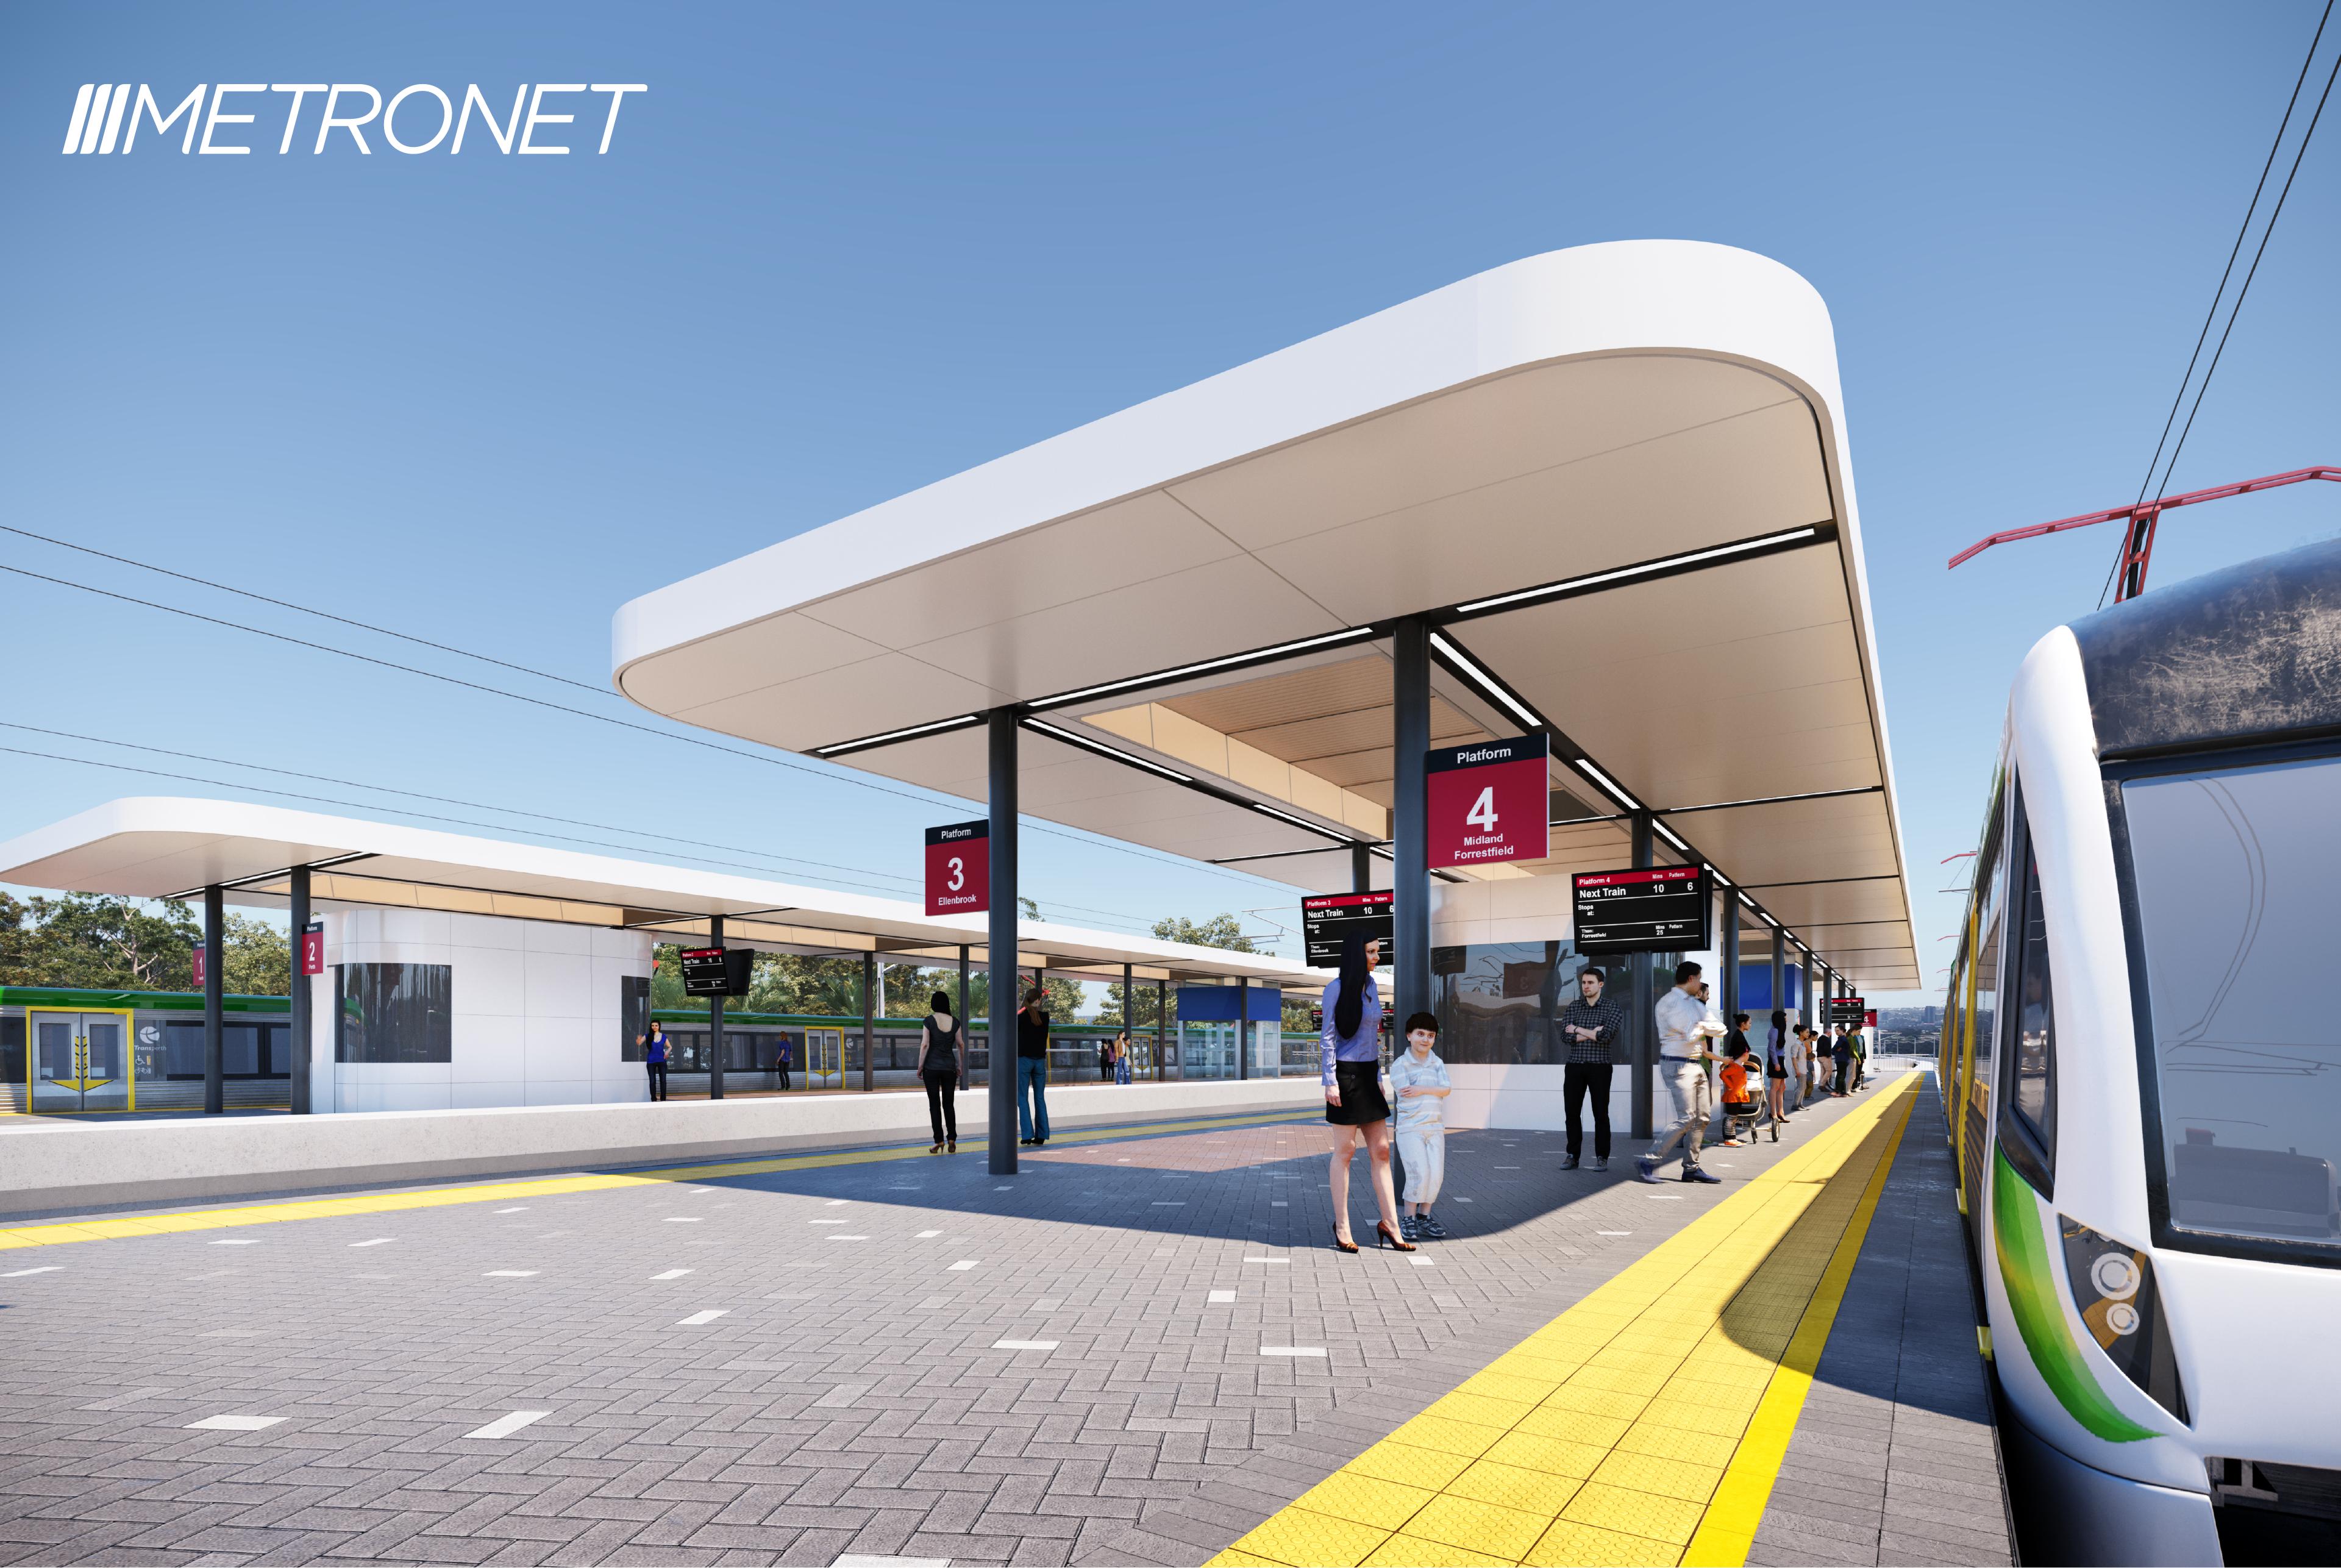 Metronet Bayswater station artist's impression